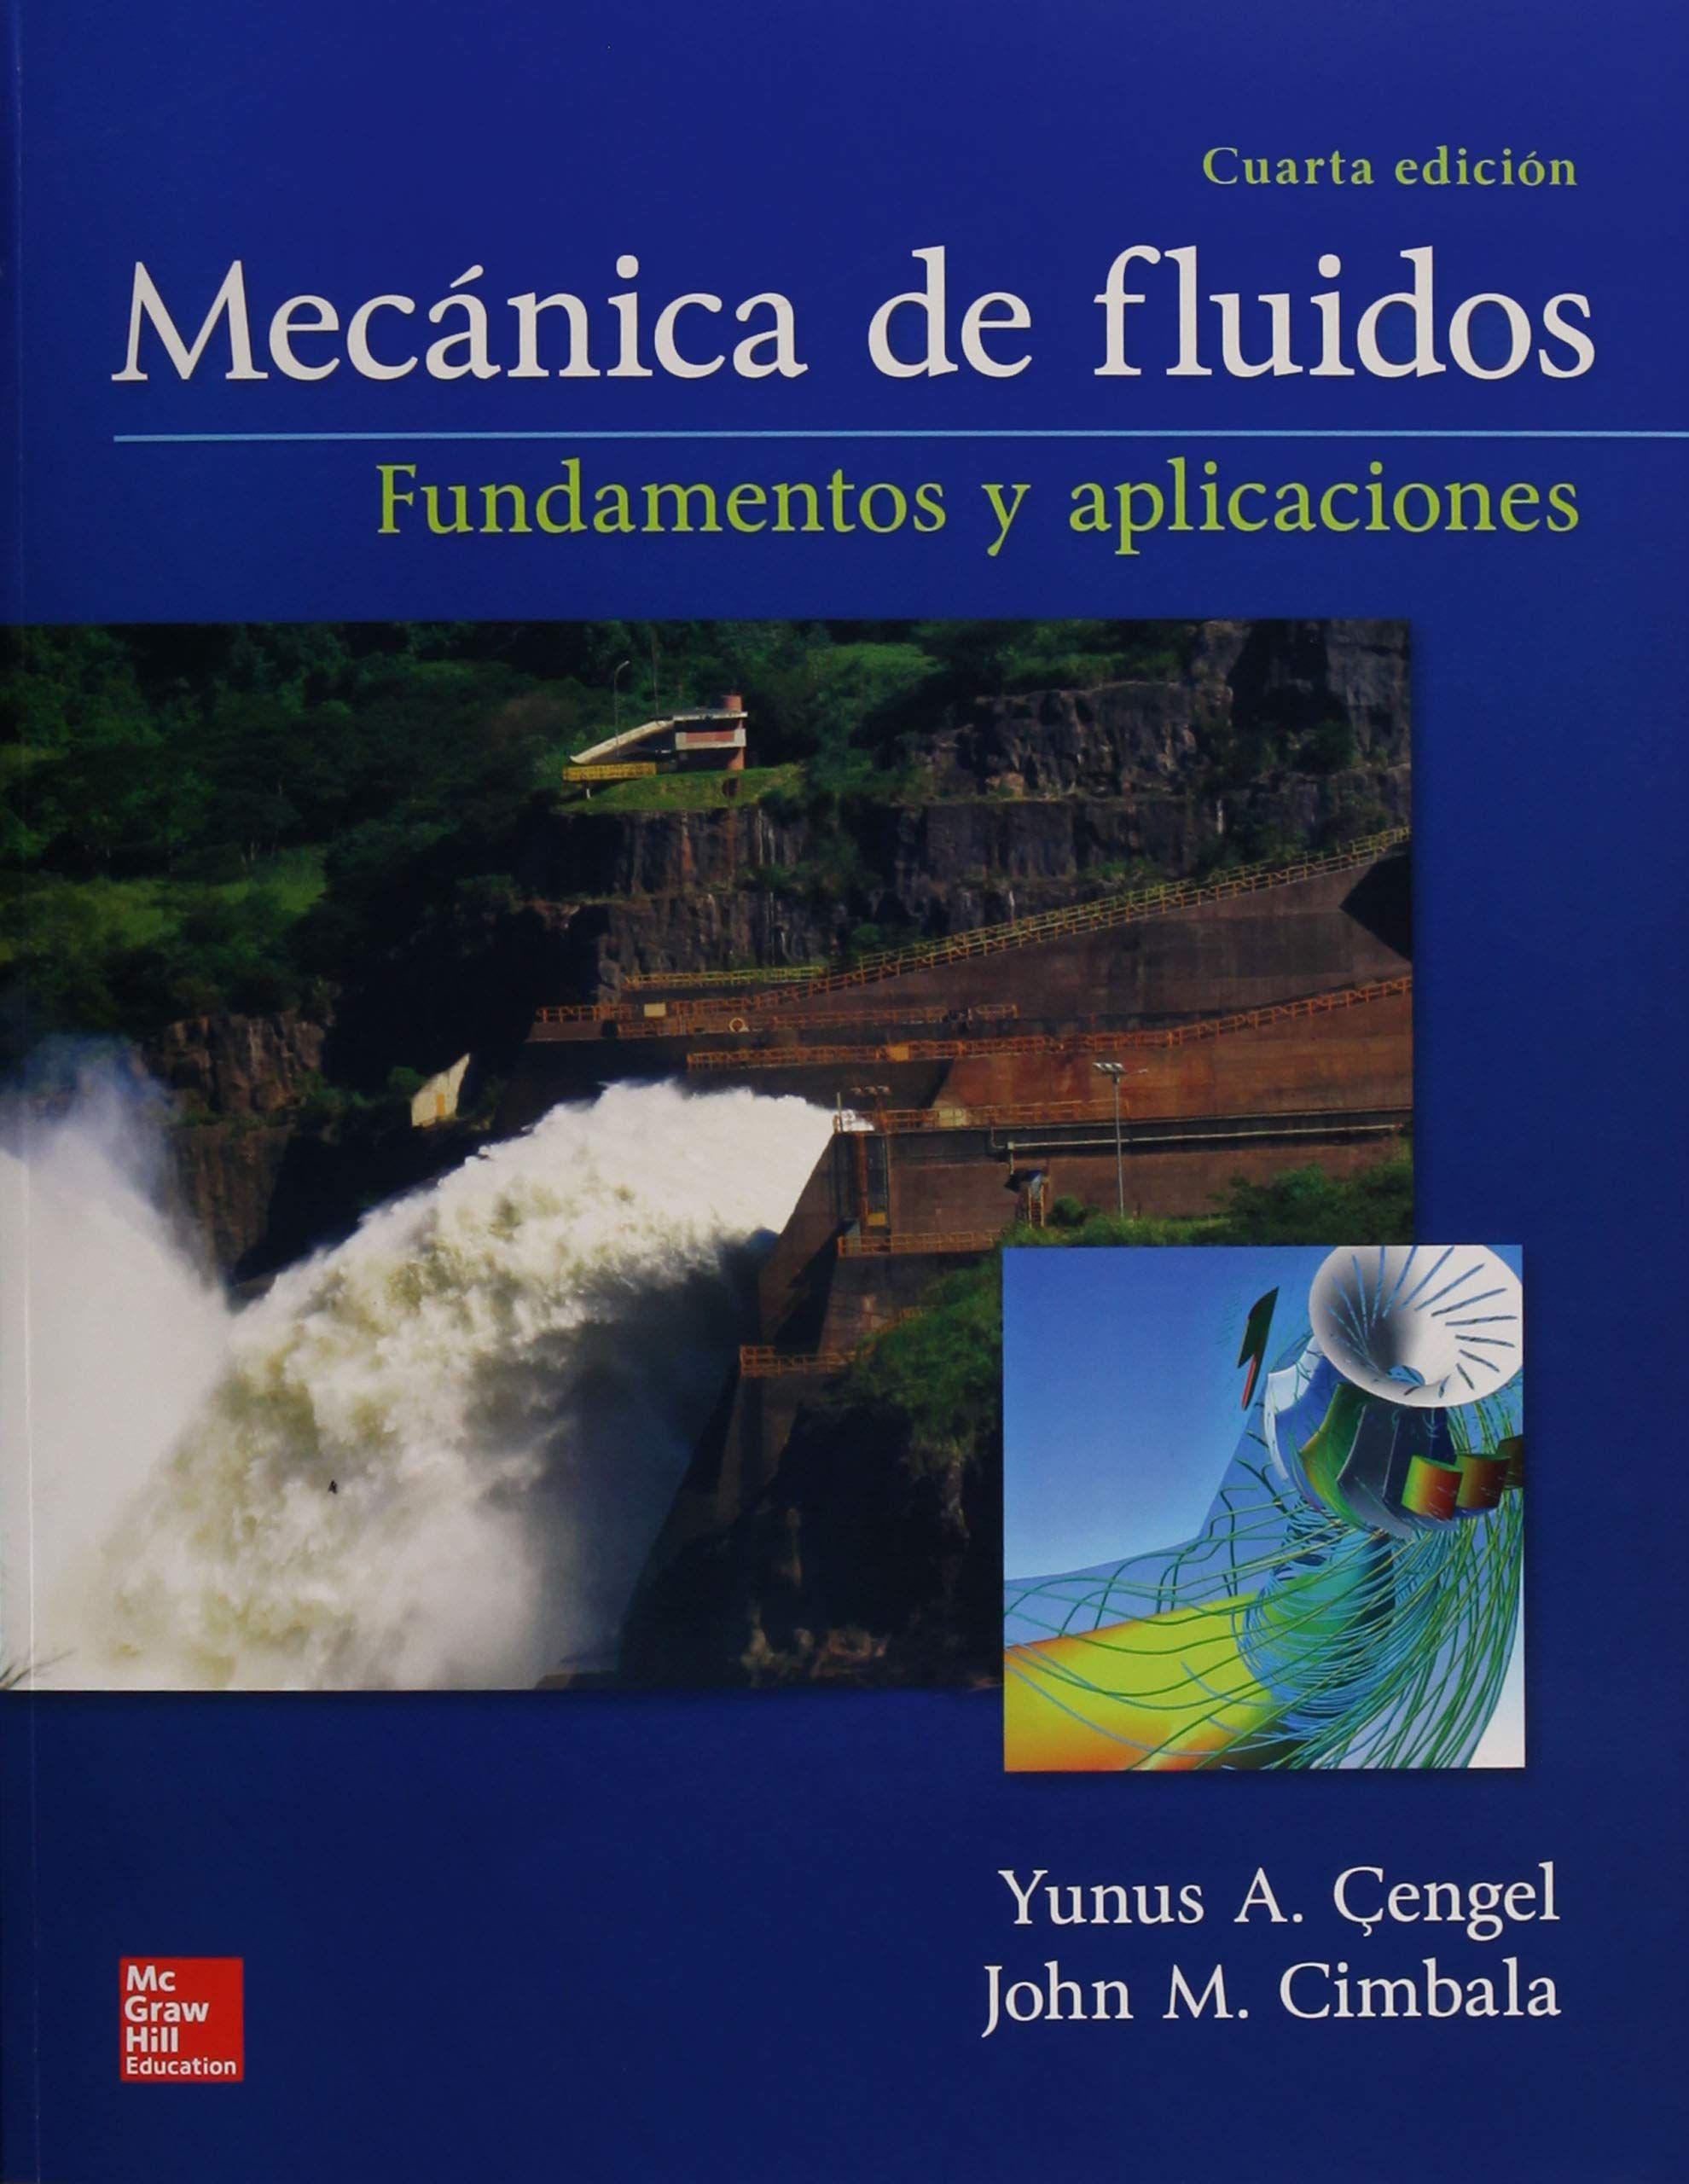 Mecánica De Fluidos Fundamentos Y Aplicaciones Yunus A çengel John M Cimbala Mecanica De Fluidos Todo Fluye Fundamentos